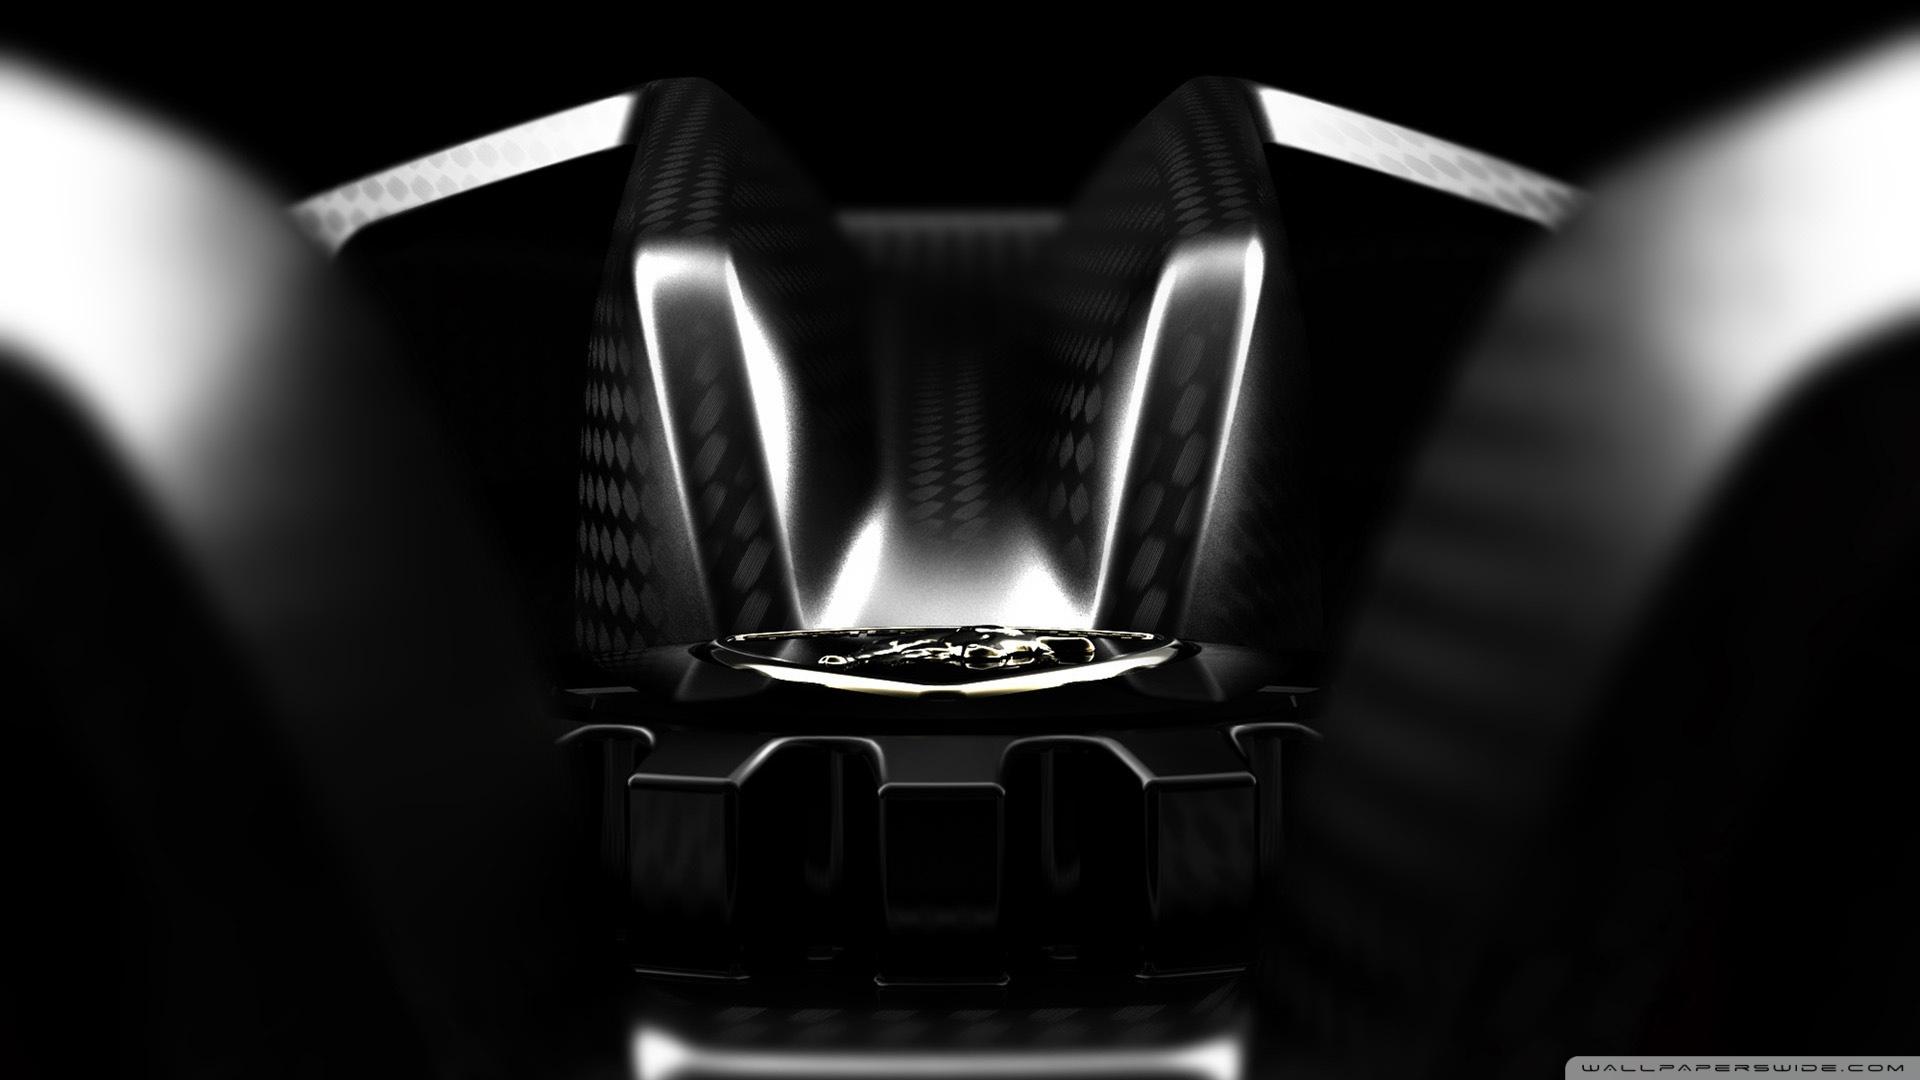 Lamborghini Sesto Elemento Wallpaper Hd Black Lamborghini 4k Hd Desktop Wallpaper For 4k Ultra Hd